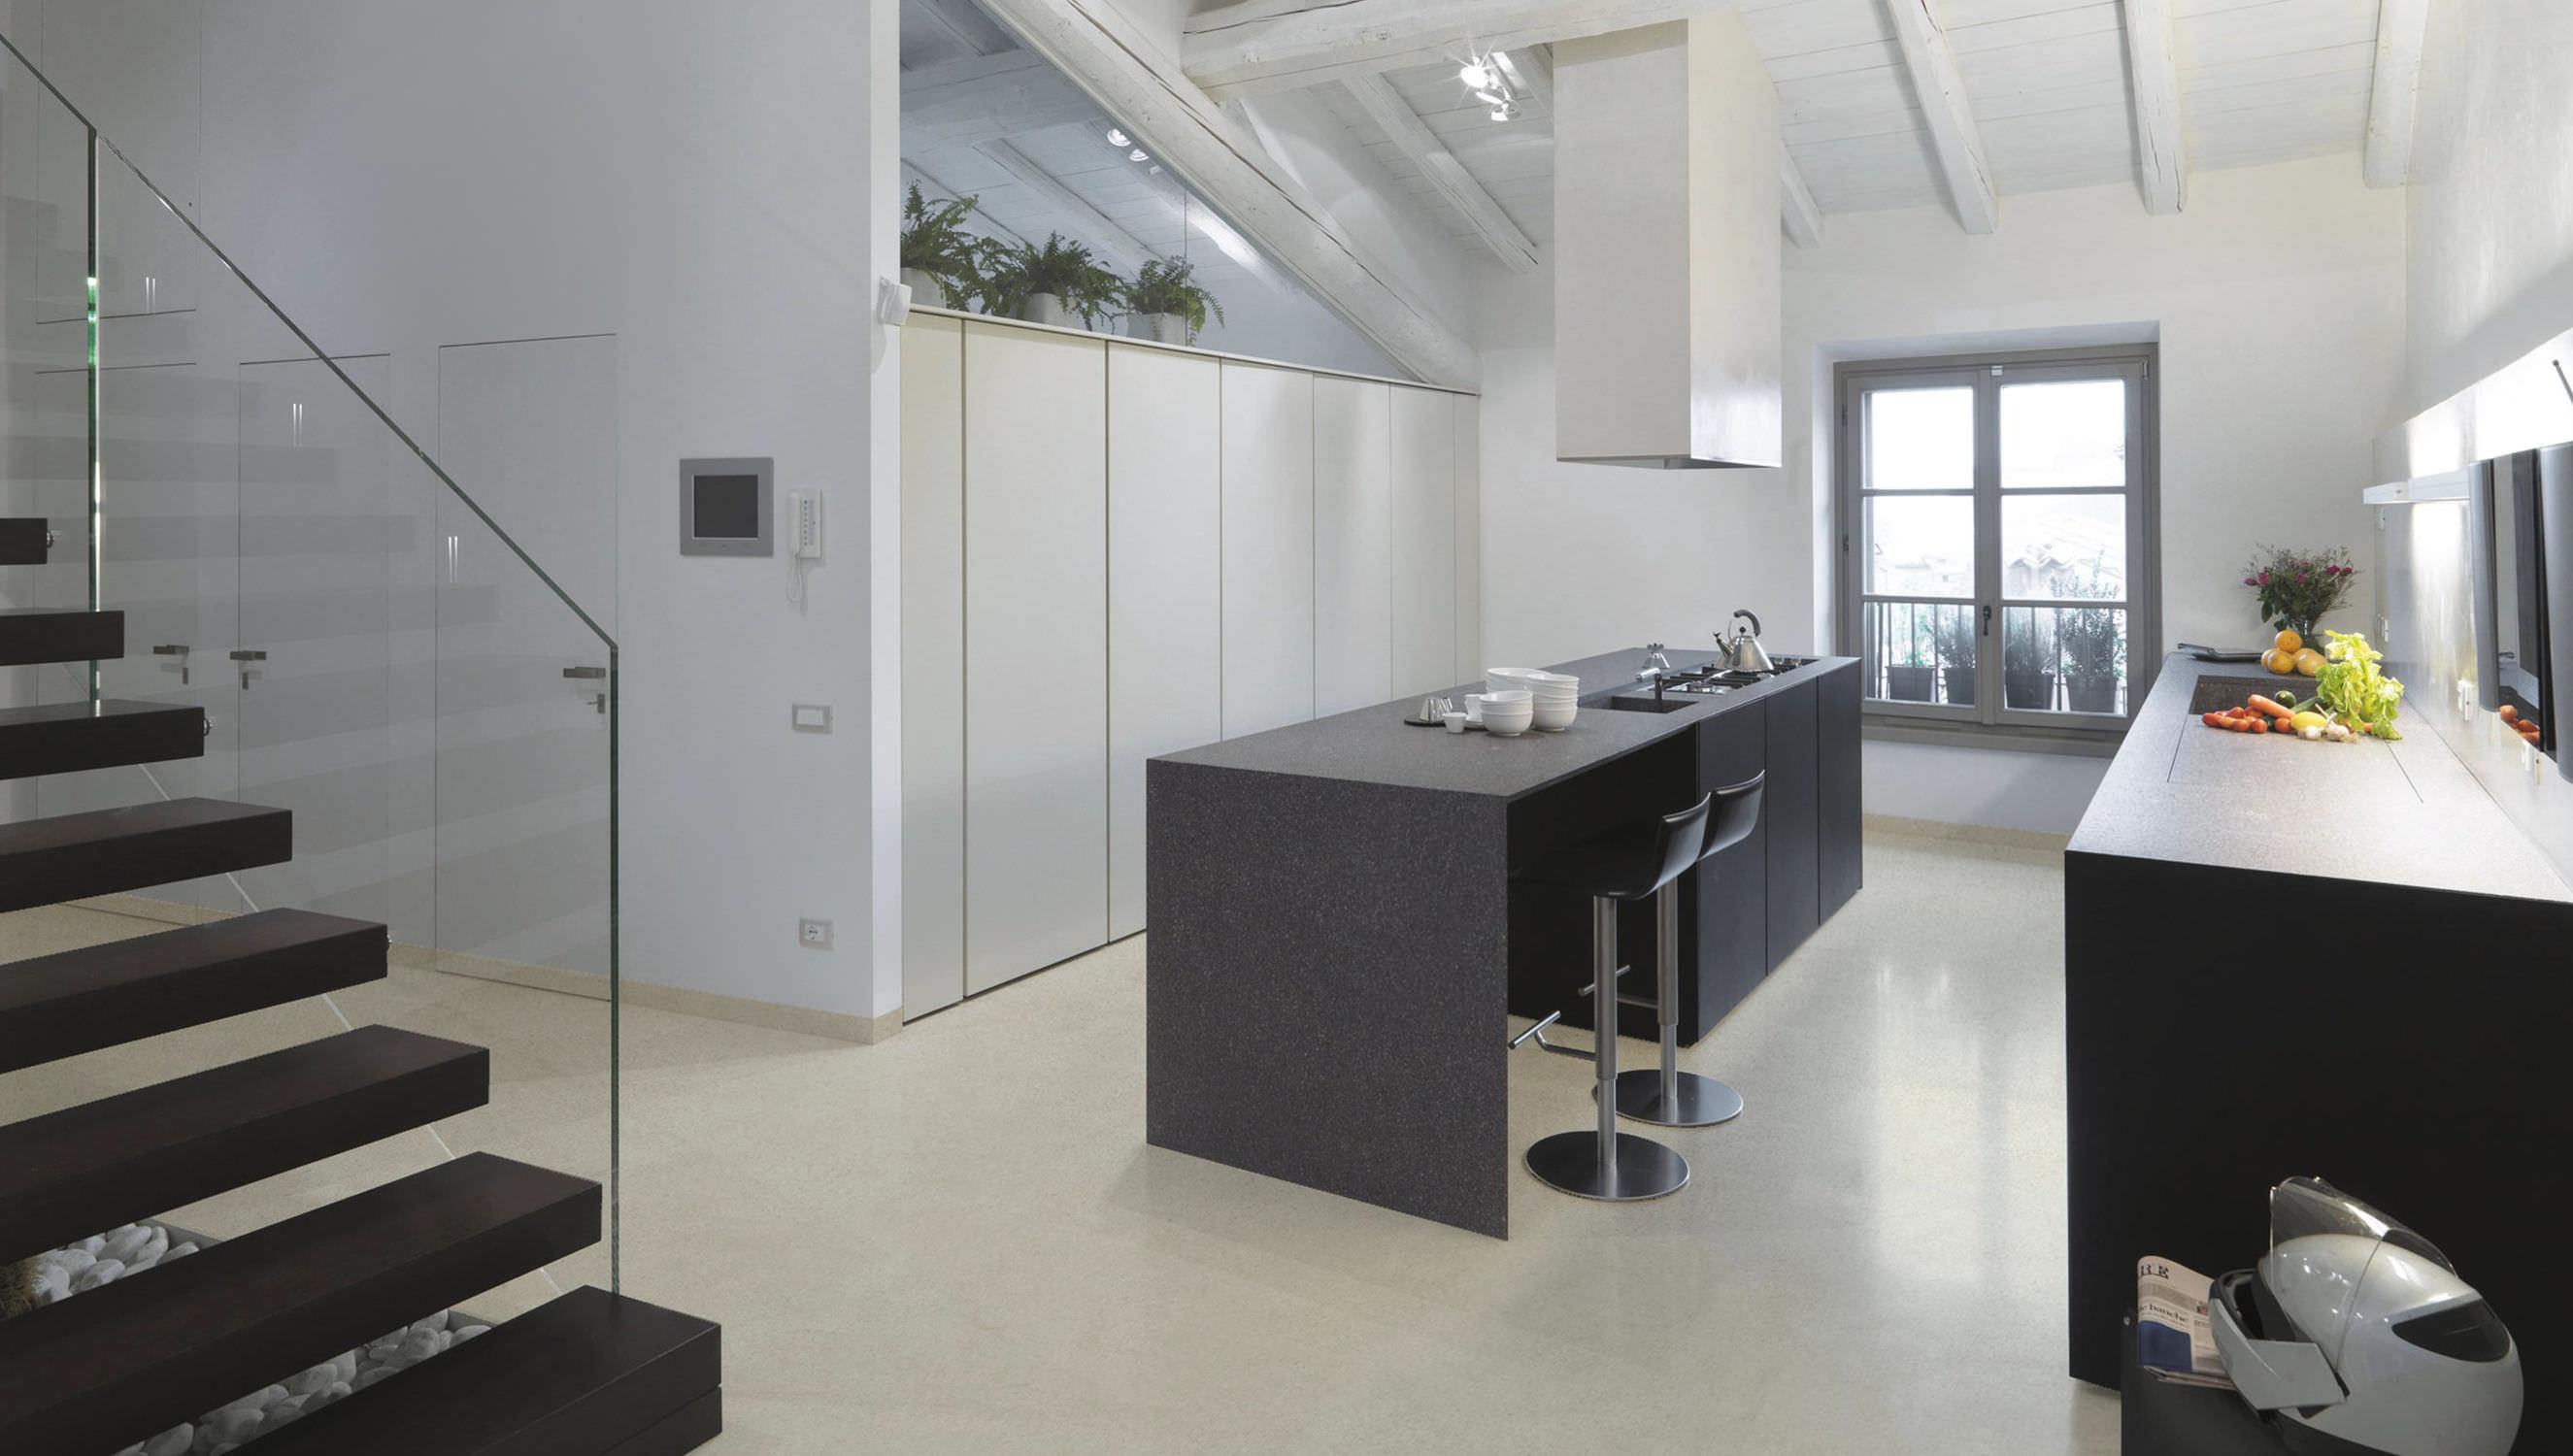 Carrelage D Int Rieur De Salon De Sol En Terrazzo Design